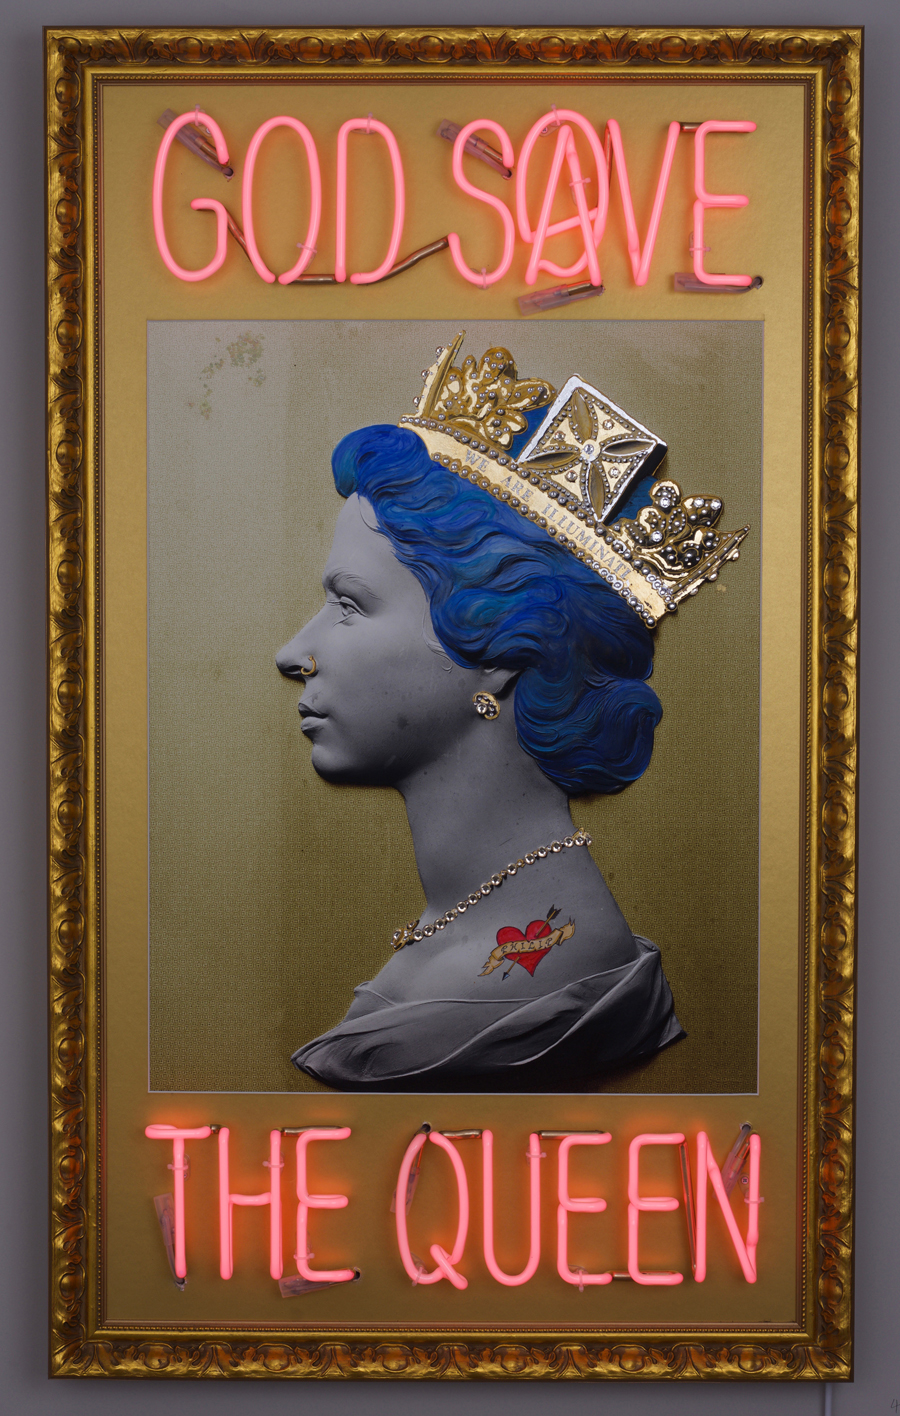 God Save The Queen. Illuminati. Herrick Gallery 2016.   herrickgallery.com